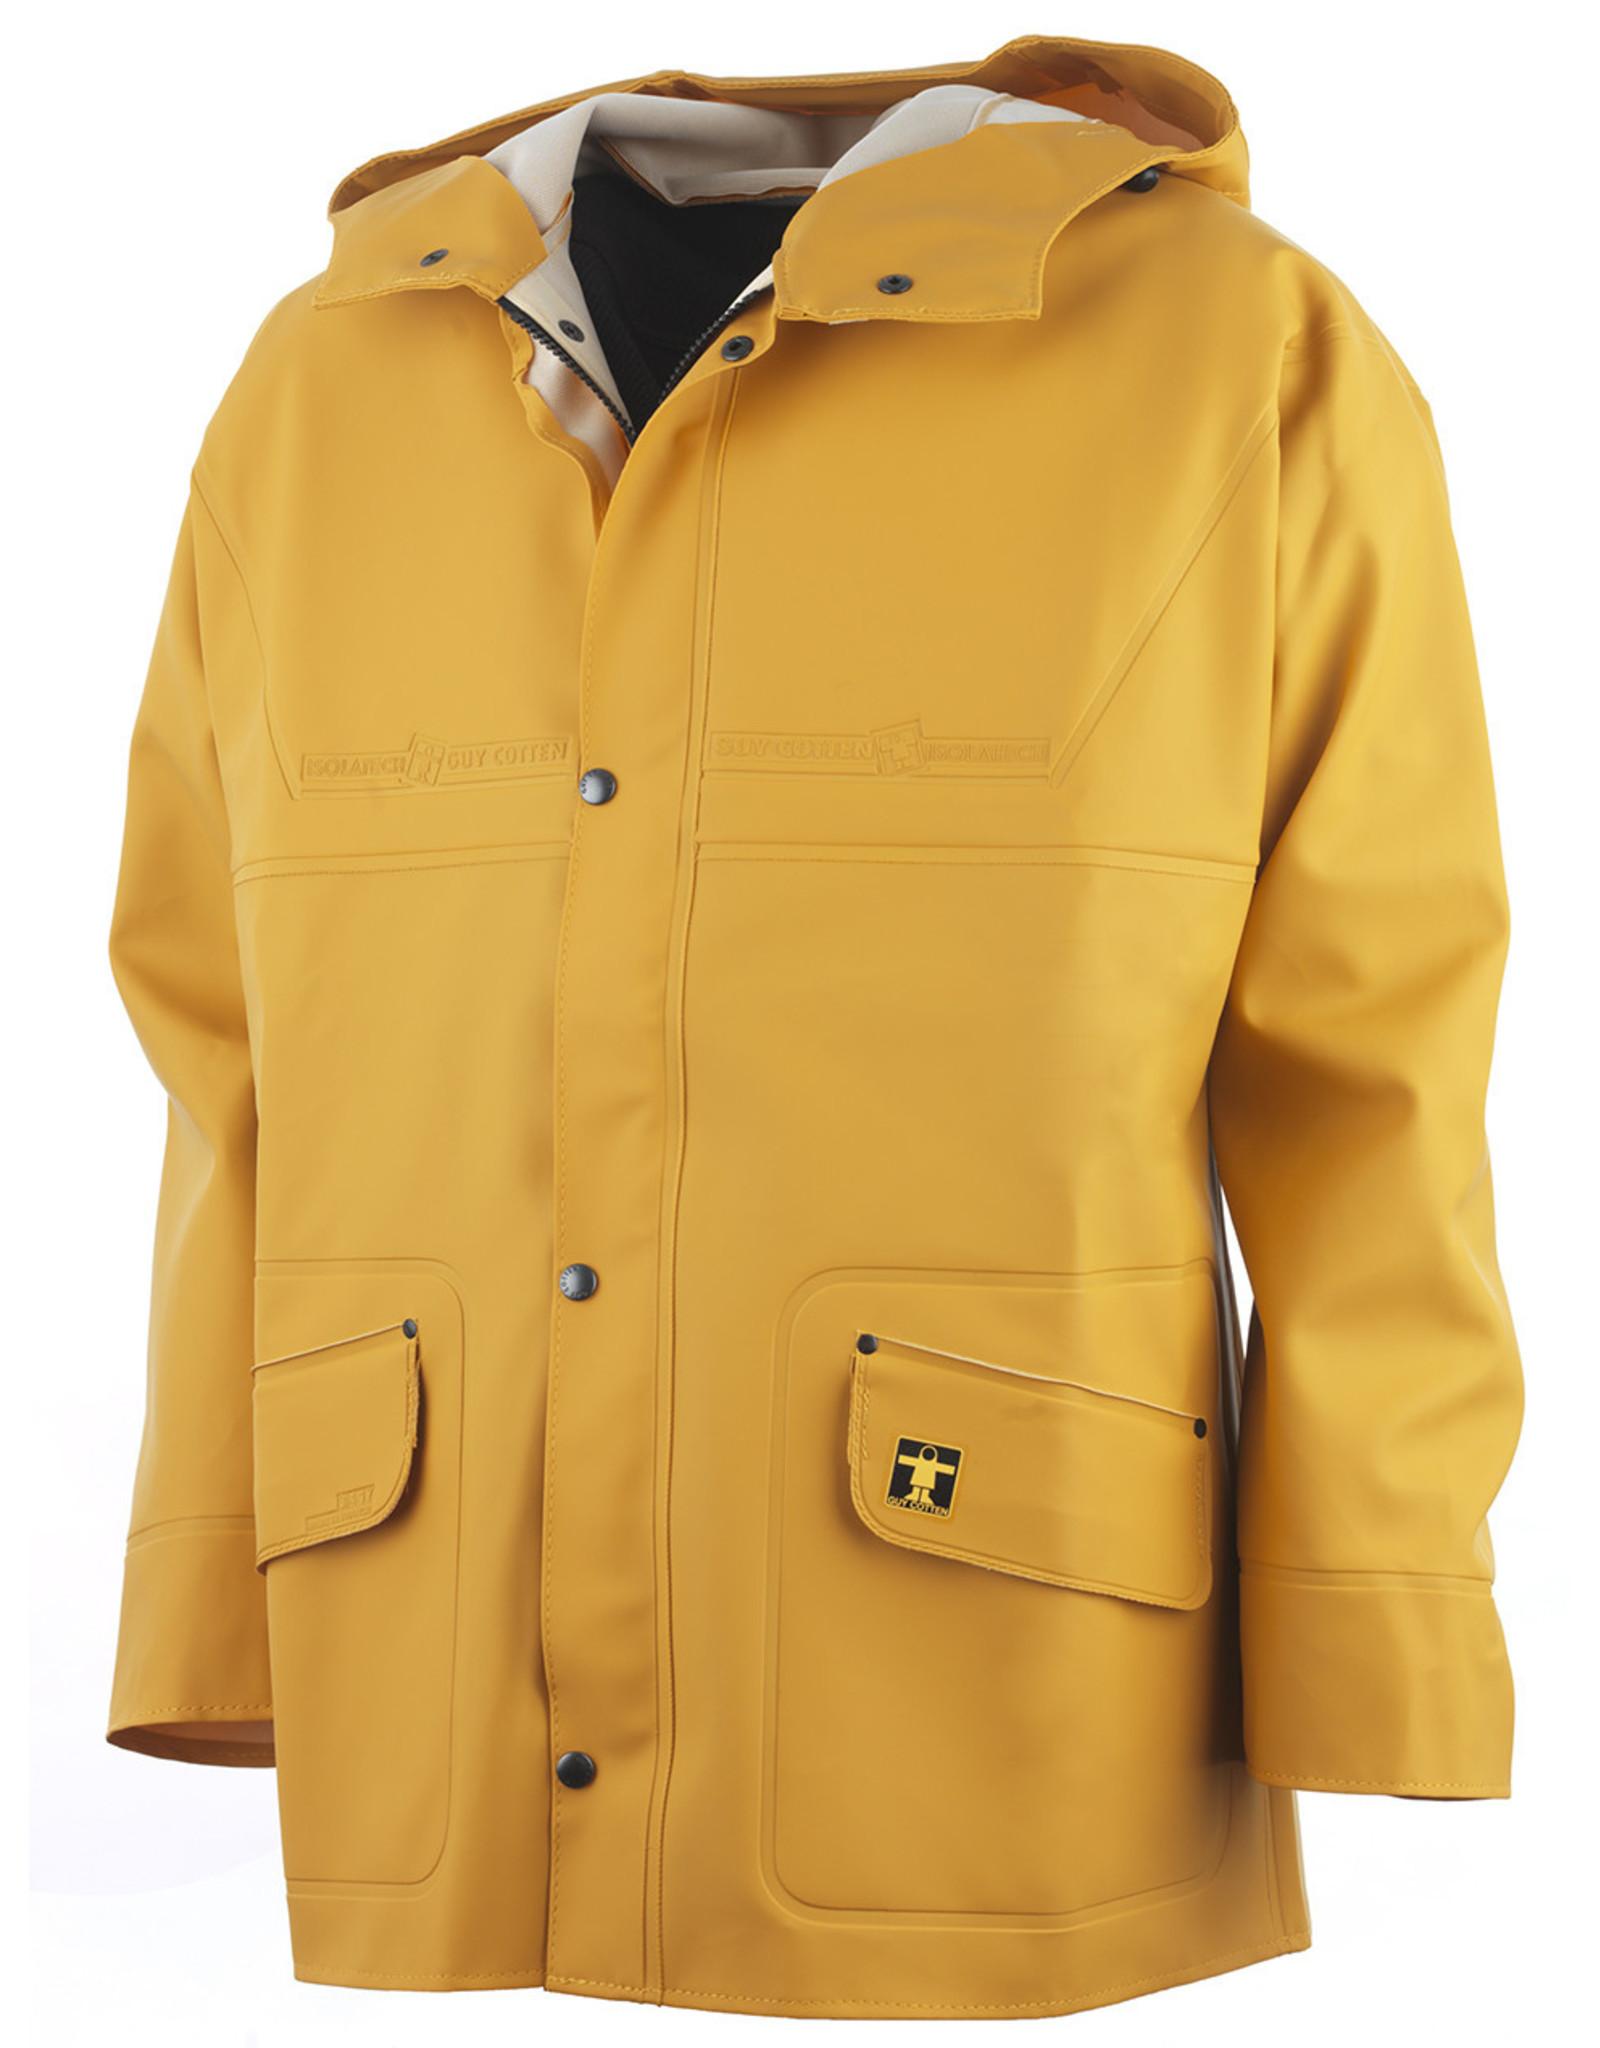 Guy Cotten Jacket ISODER Glentex